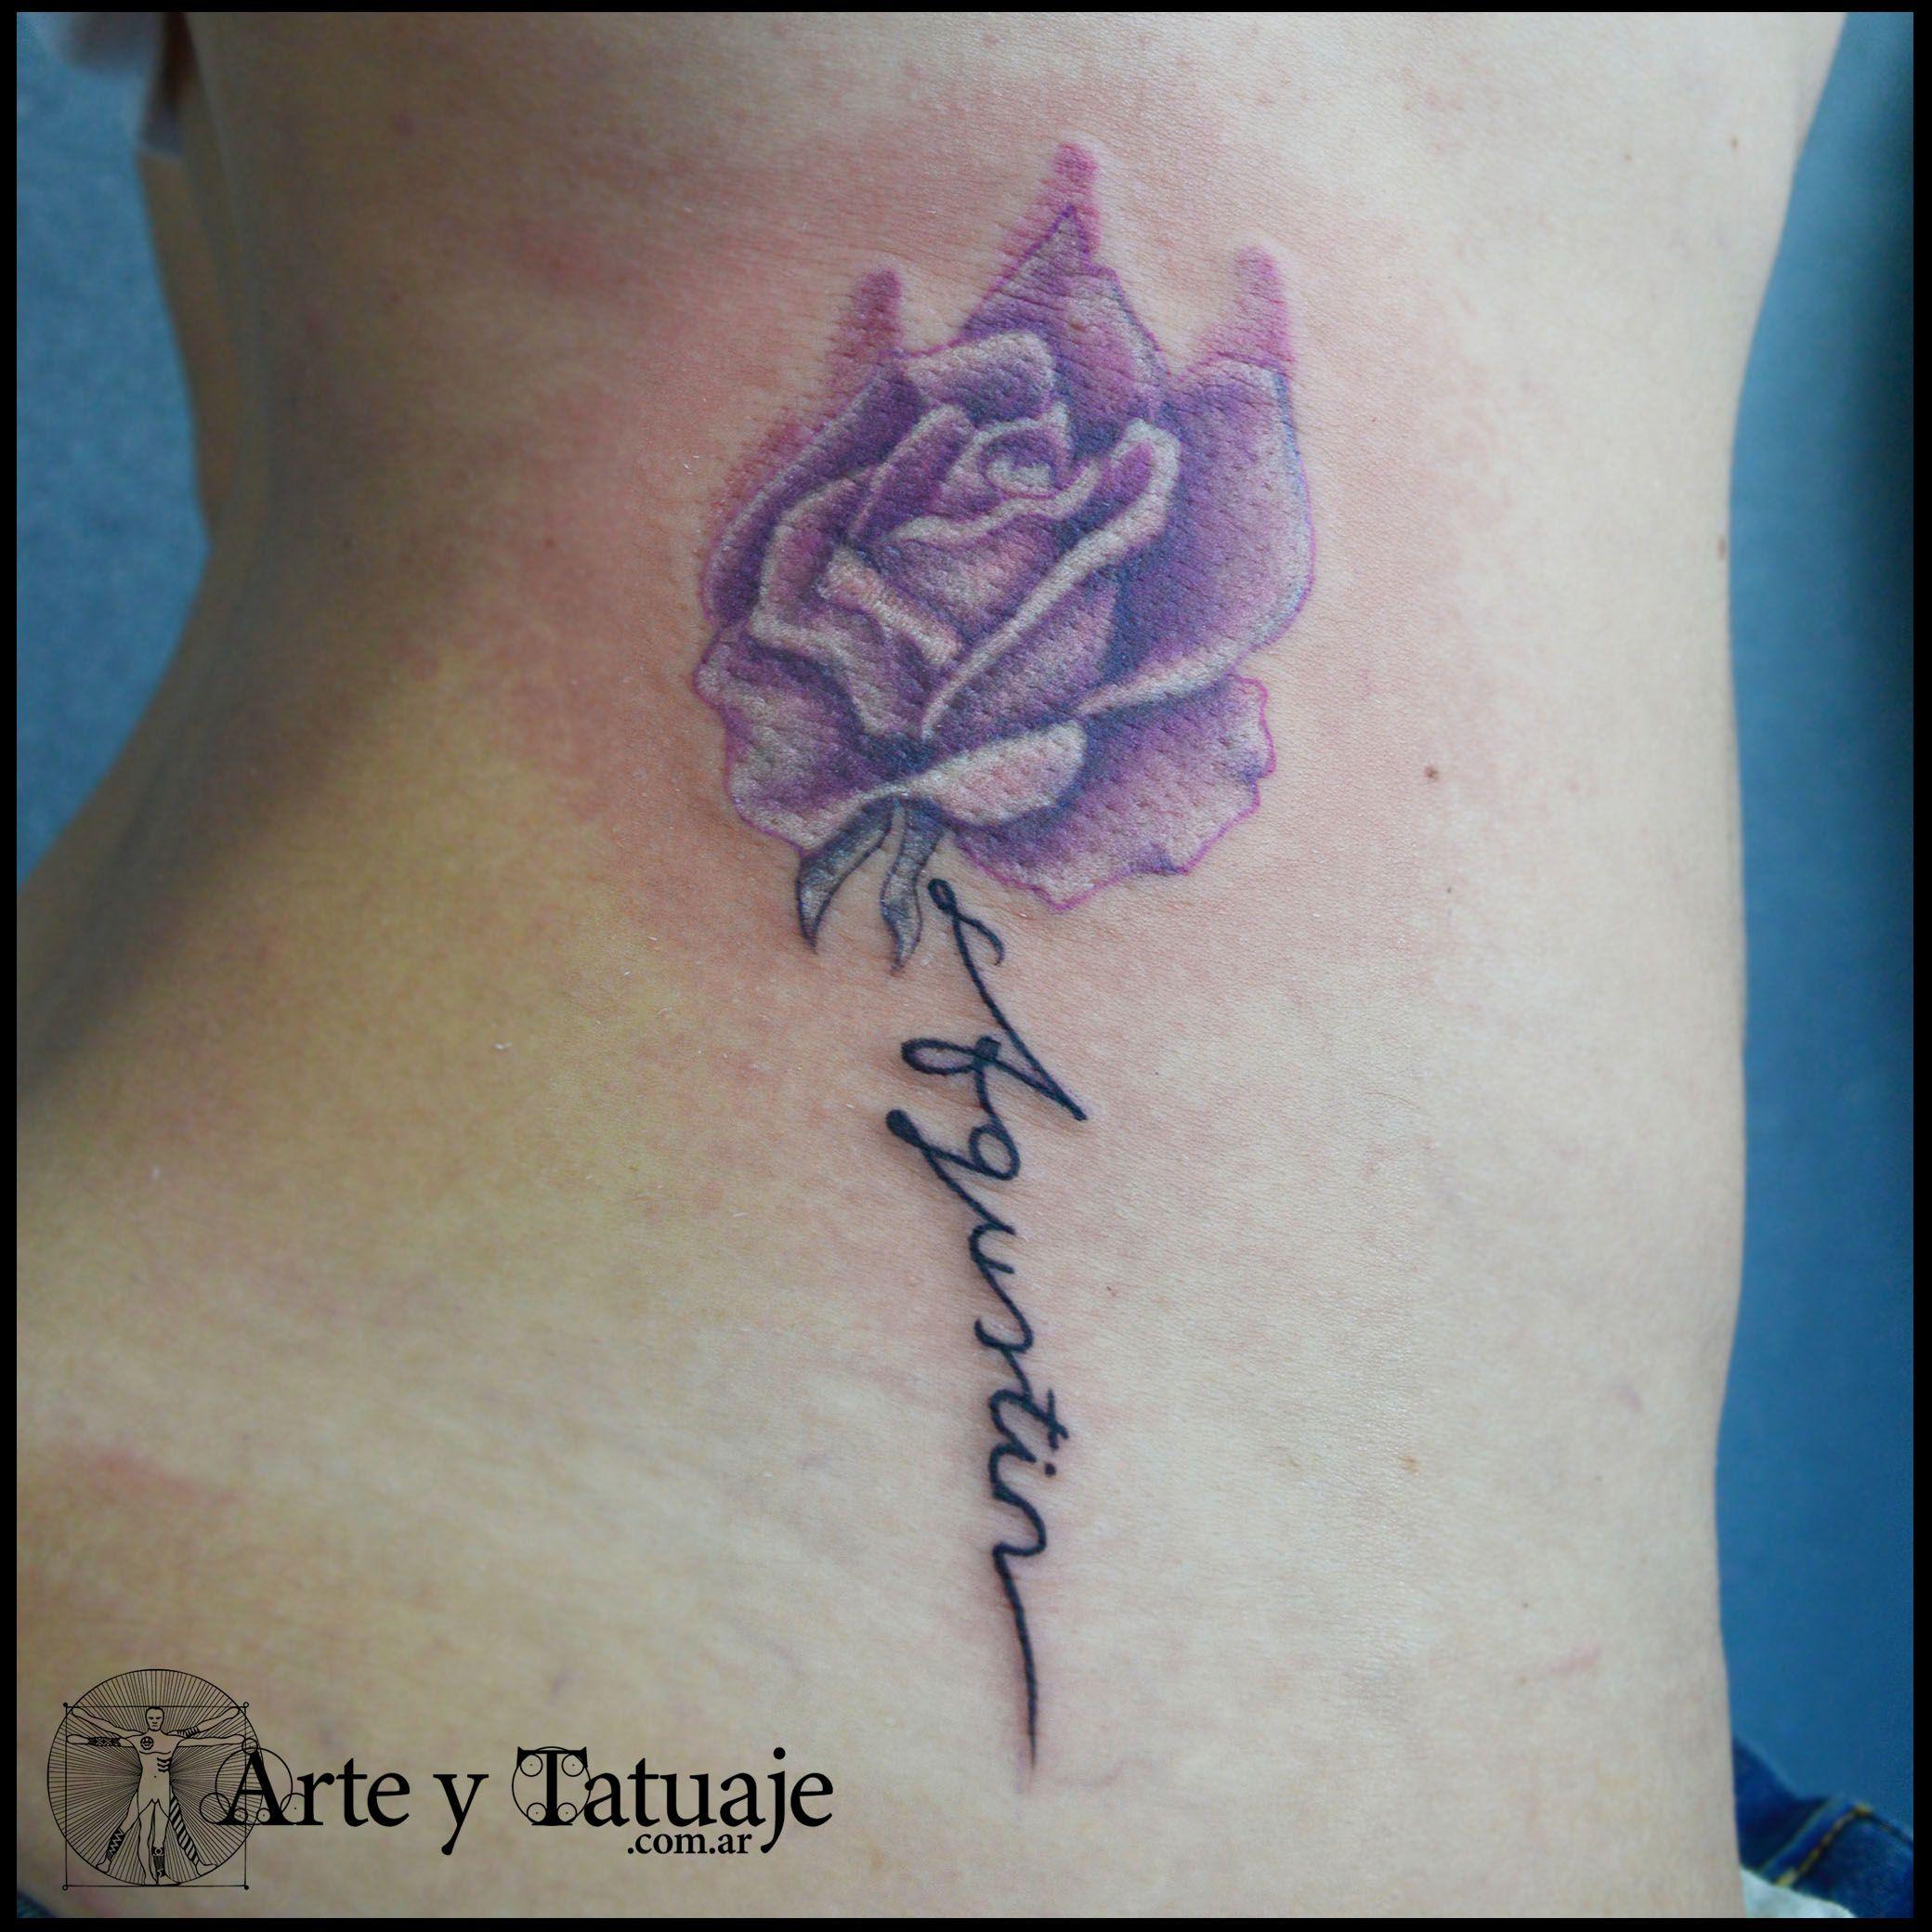 Tatuaje de rosa con nombre, por Leandro en #arteytatuaje #tattoo #design # tattoos #tattoolife #INK #in… | Tatuaje a color, Artistas del tatuaje, Rosas  con nombres